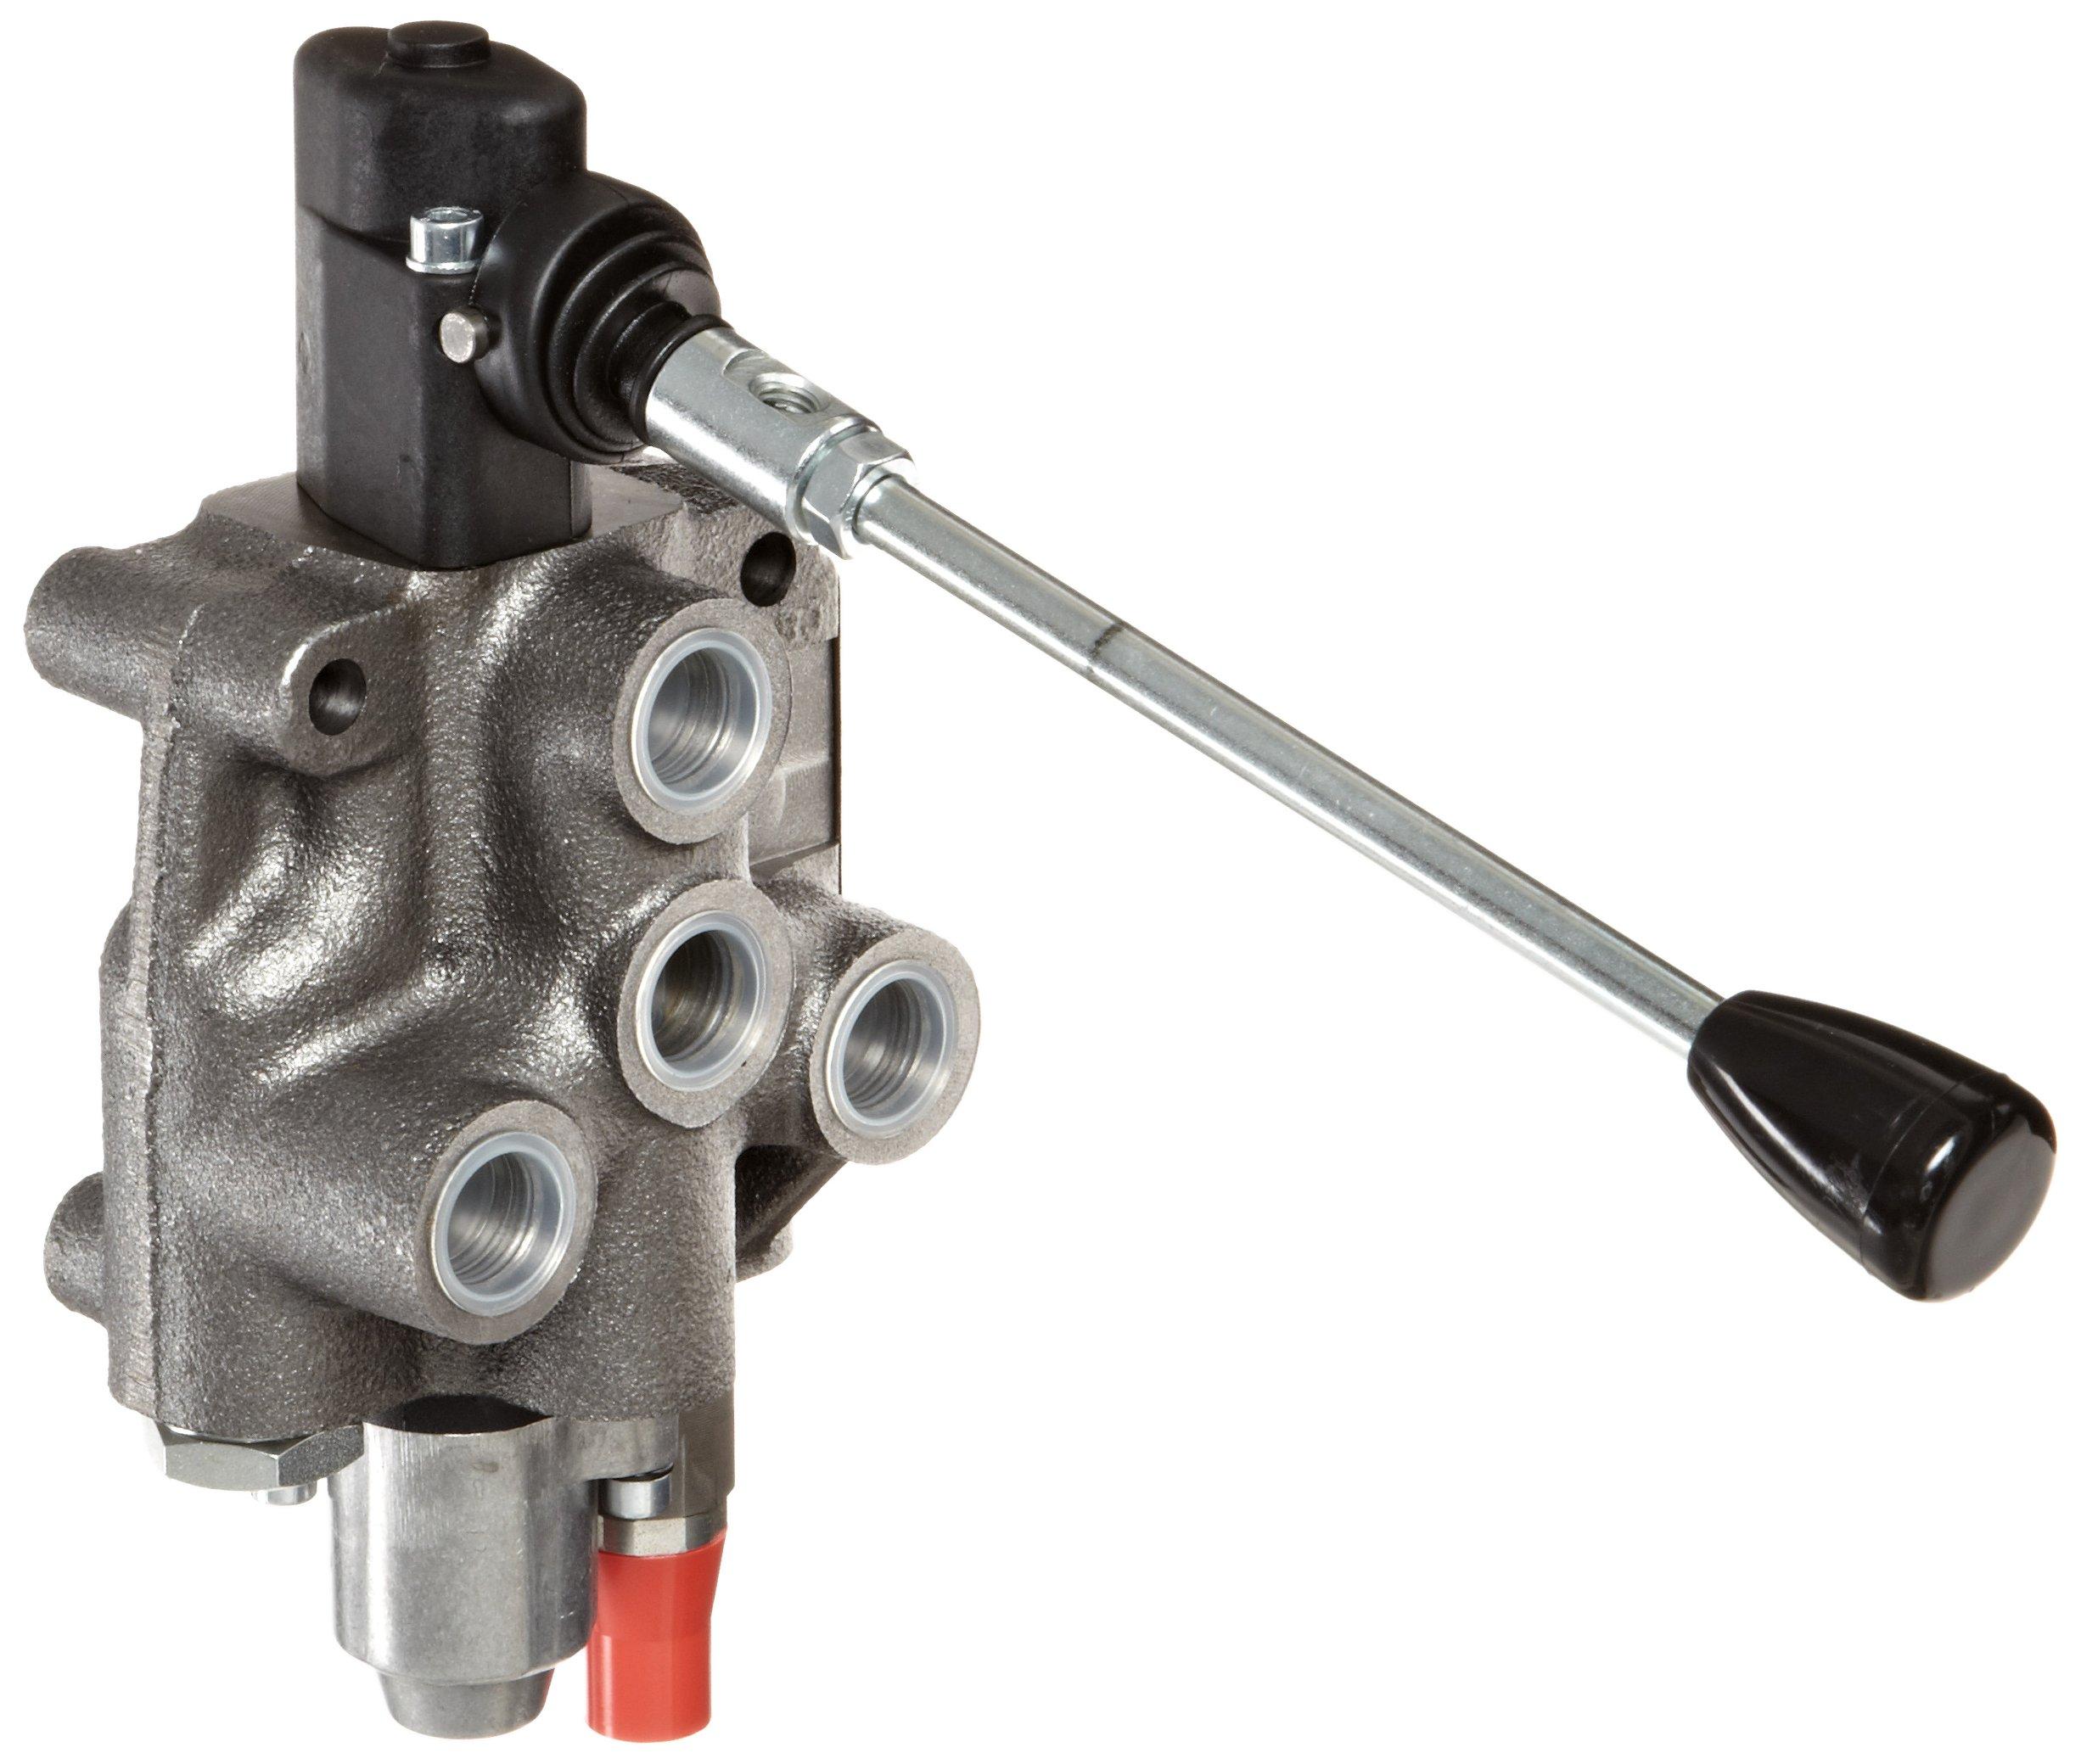 Prince WVS11C5C1 Directional Control Valve, Monoblock, Cast Iron, 1 Spool, 4 Ways, 3 Positions, Motor, 3 Position Detent, Lever Handle, 4000 psi, 14 gpm, 8 SAE